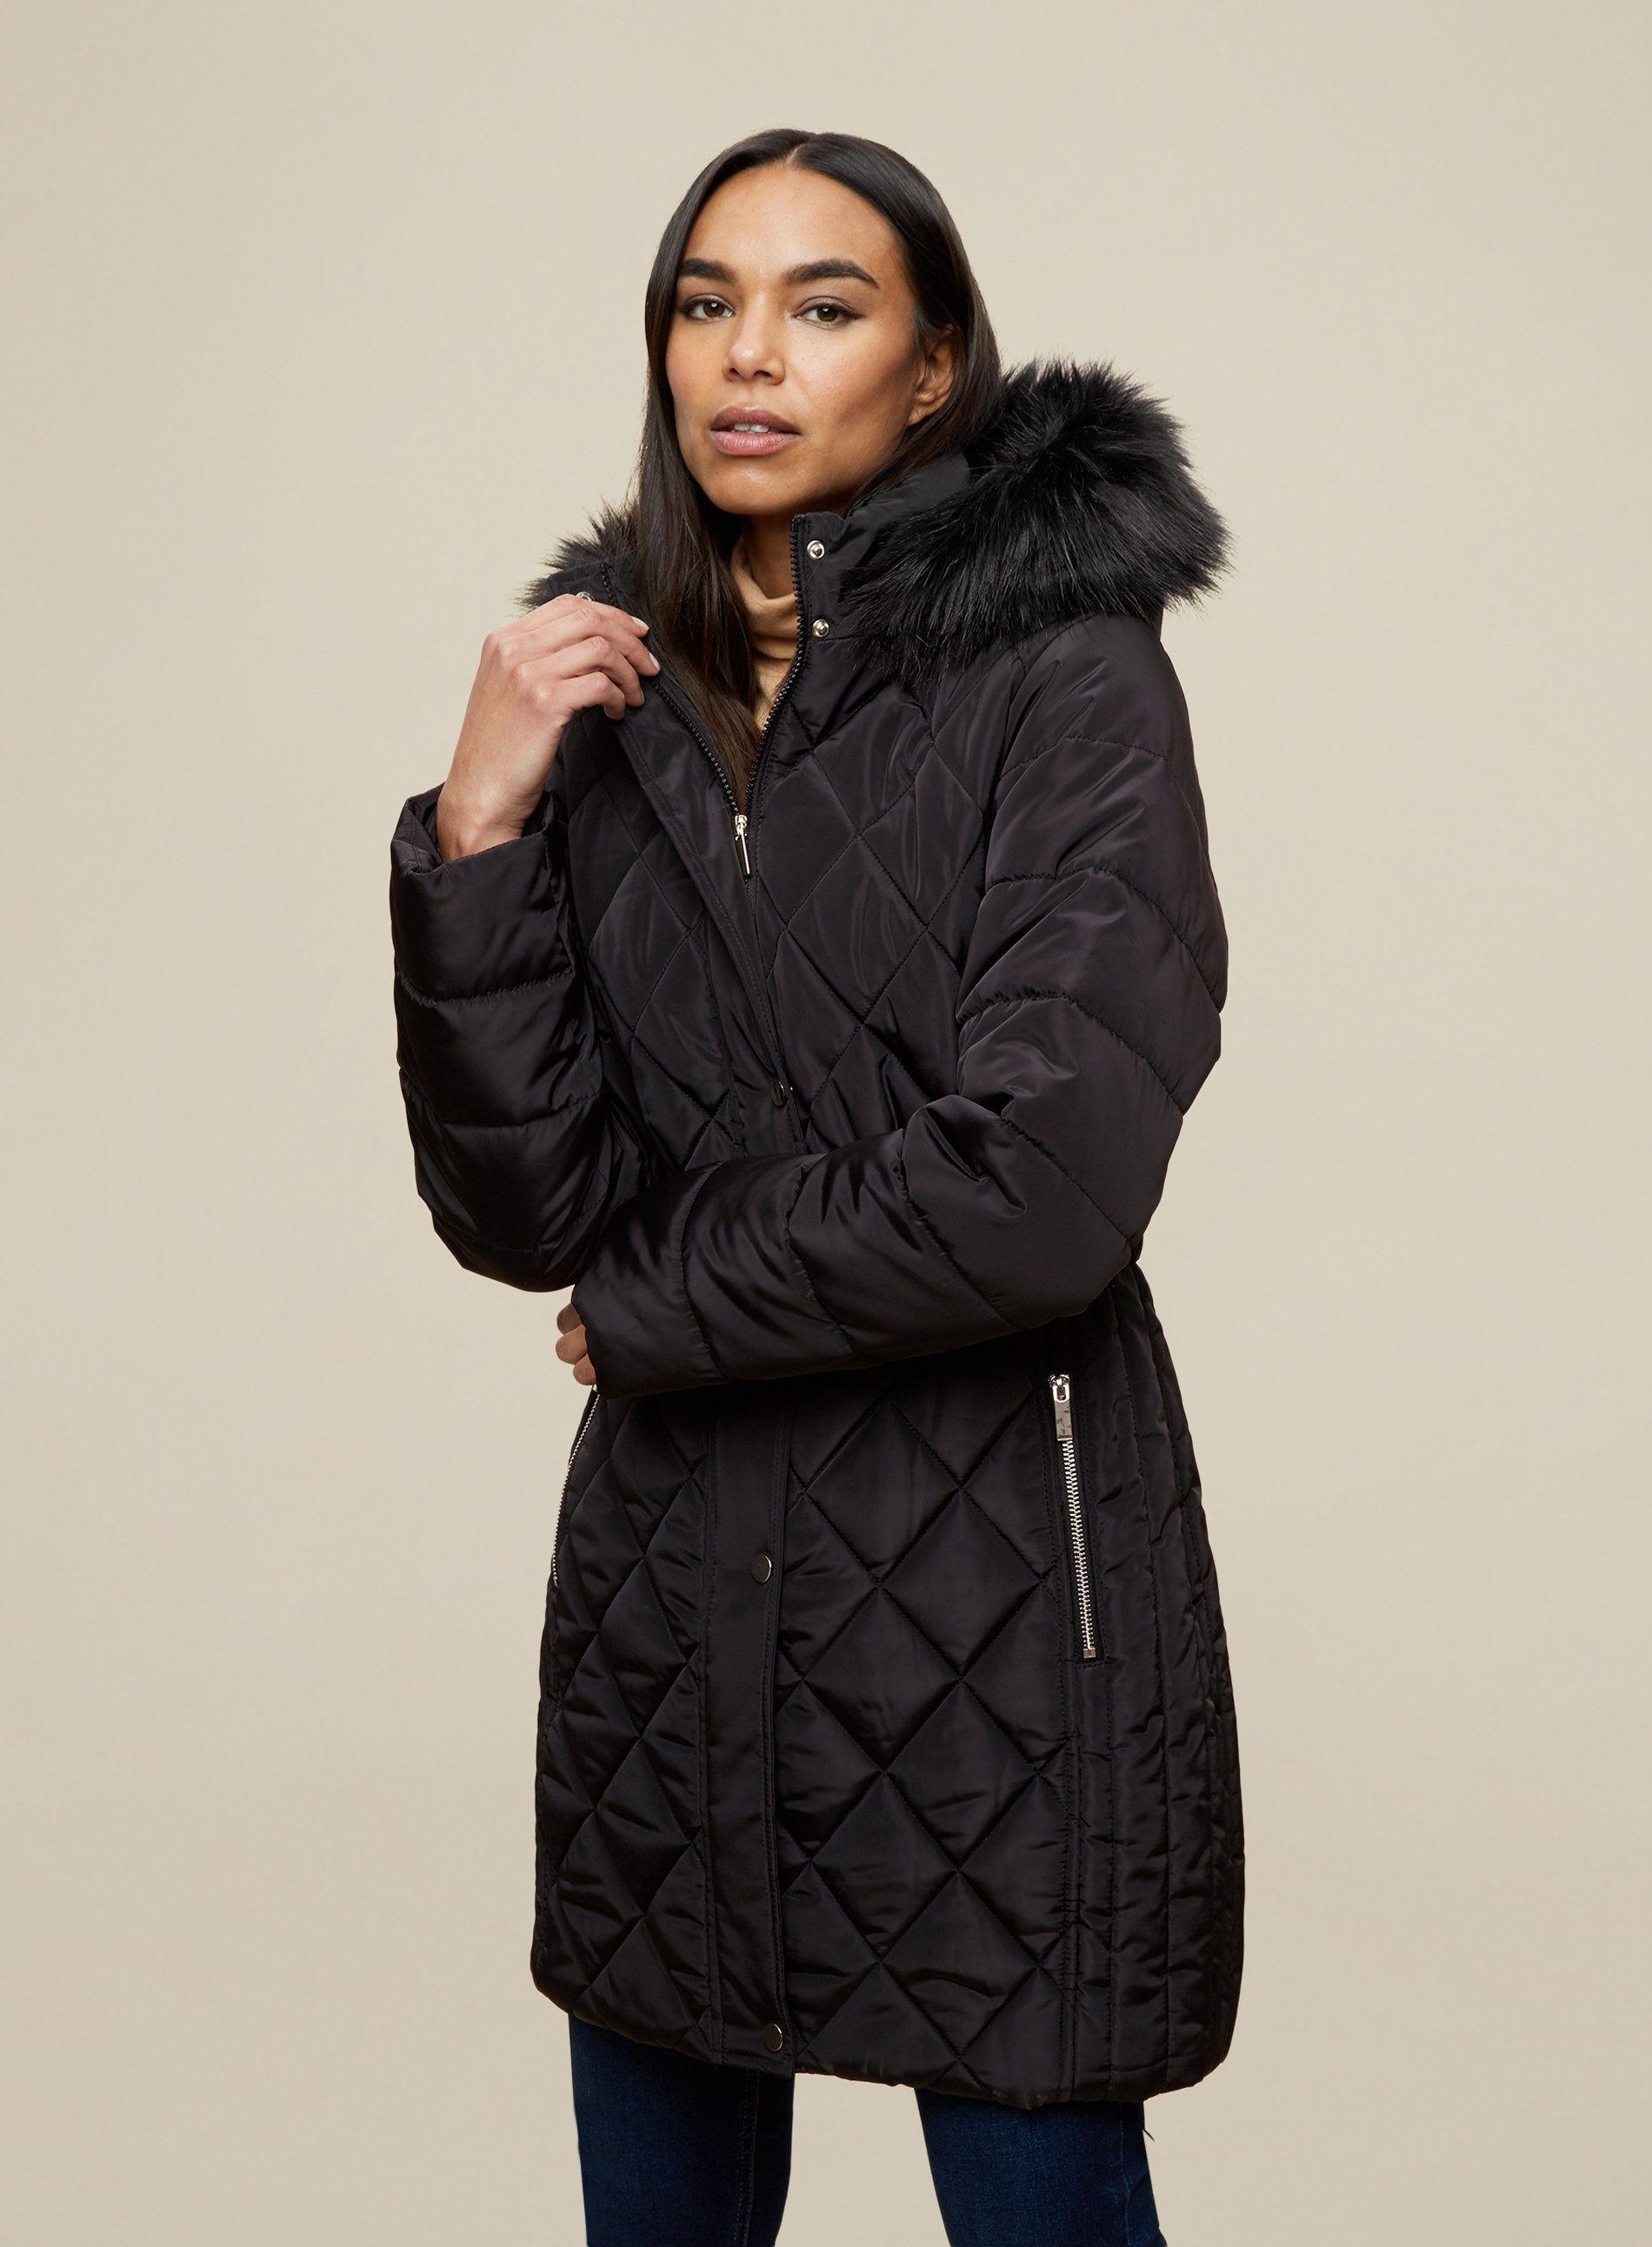 Dorothy Perkins Womens Black Long Fur Neck Jacket Puffer Coat Outwear Top